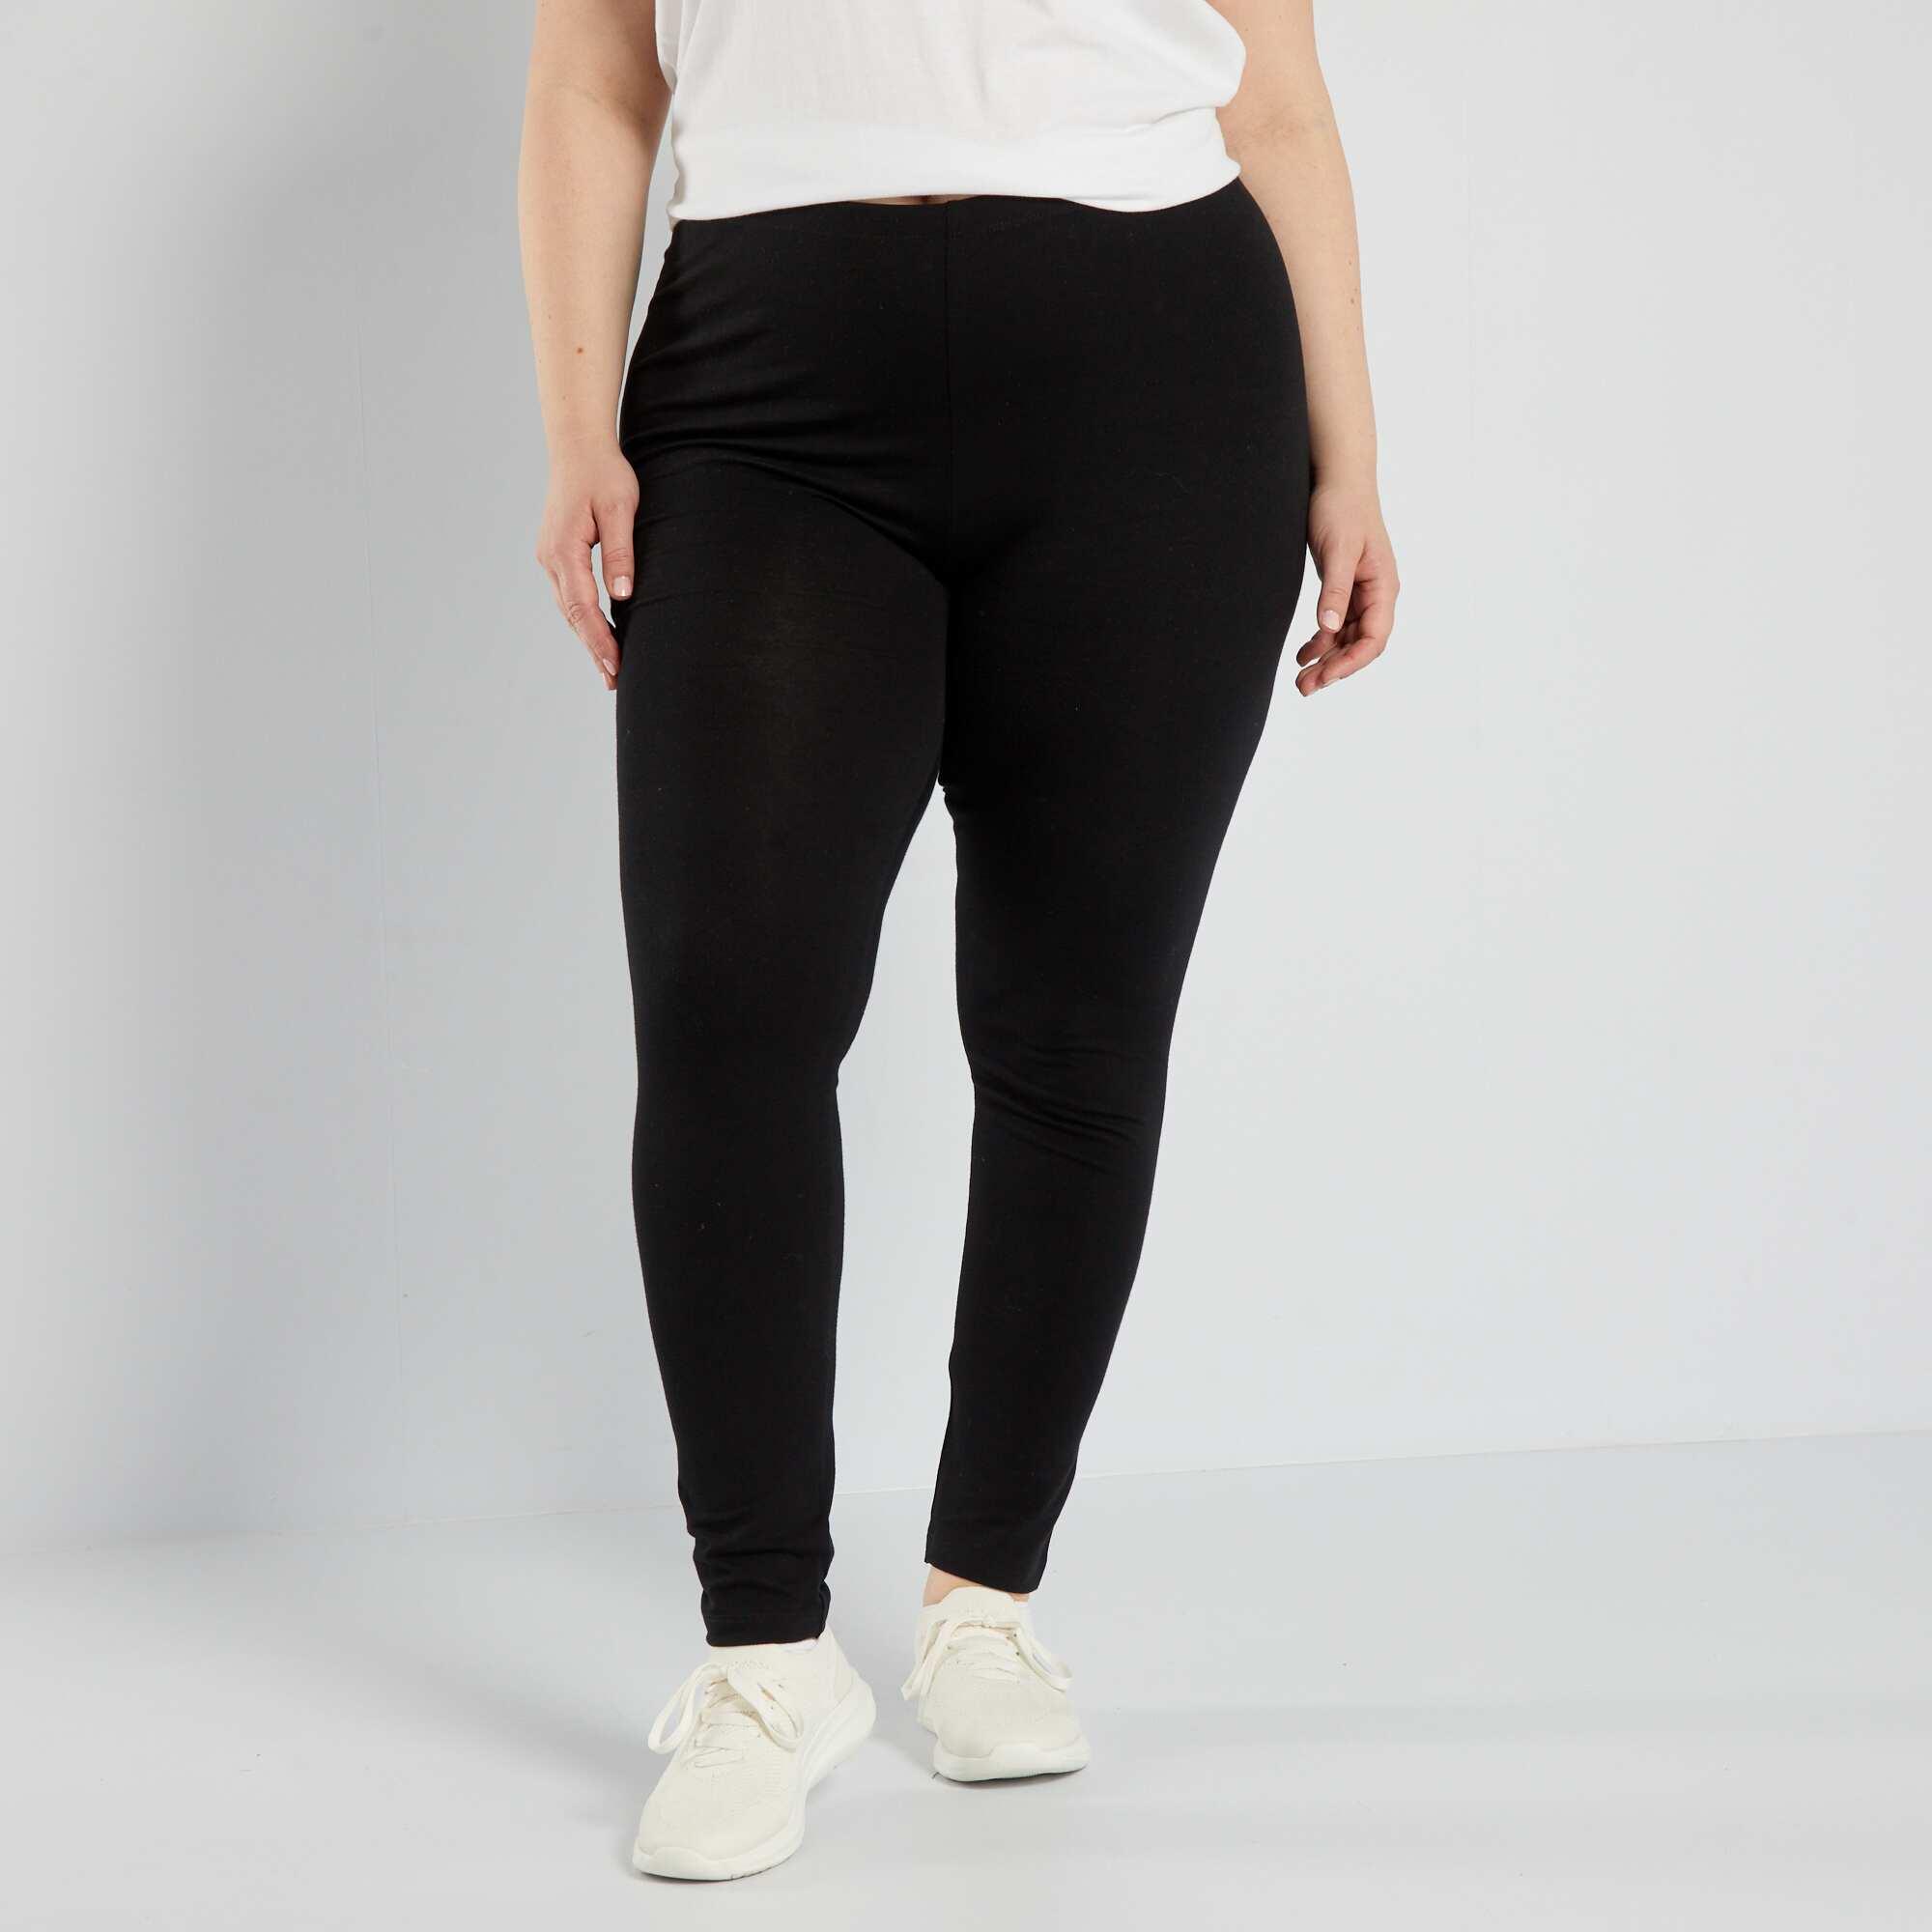 legging long coton stretch grande taille femme noir kiabi 9 00. Black Bedroom Furniture Sets. Home Design Ideas